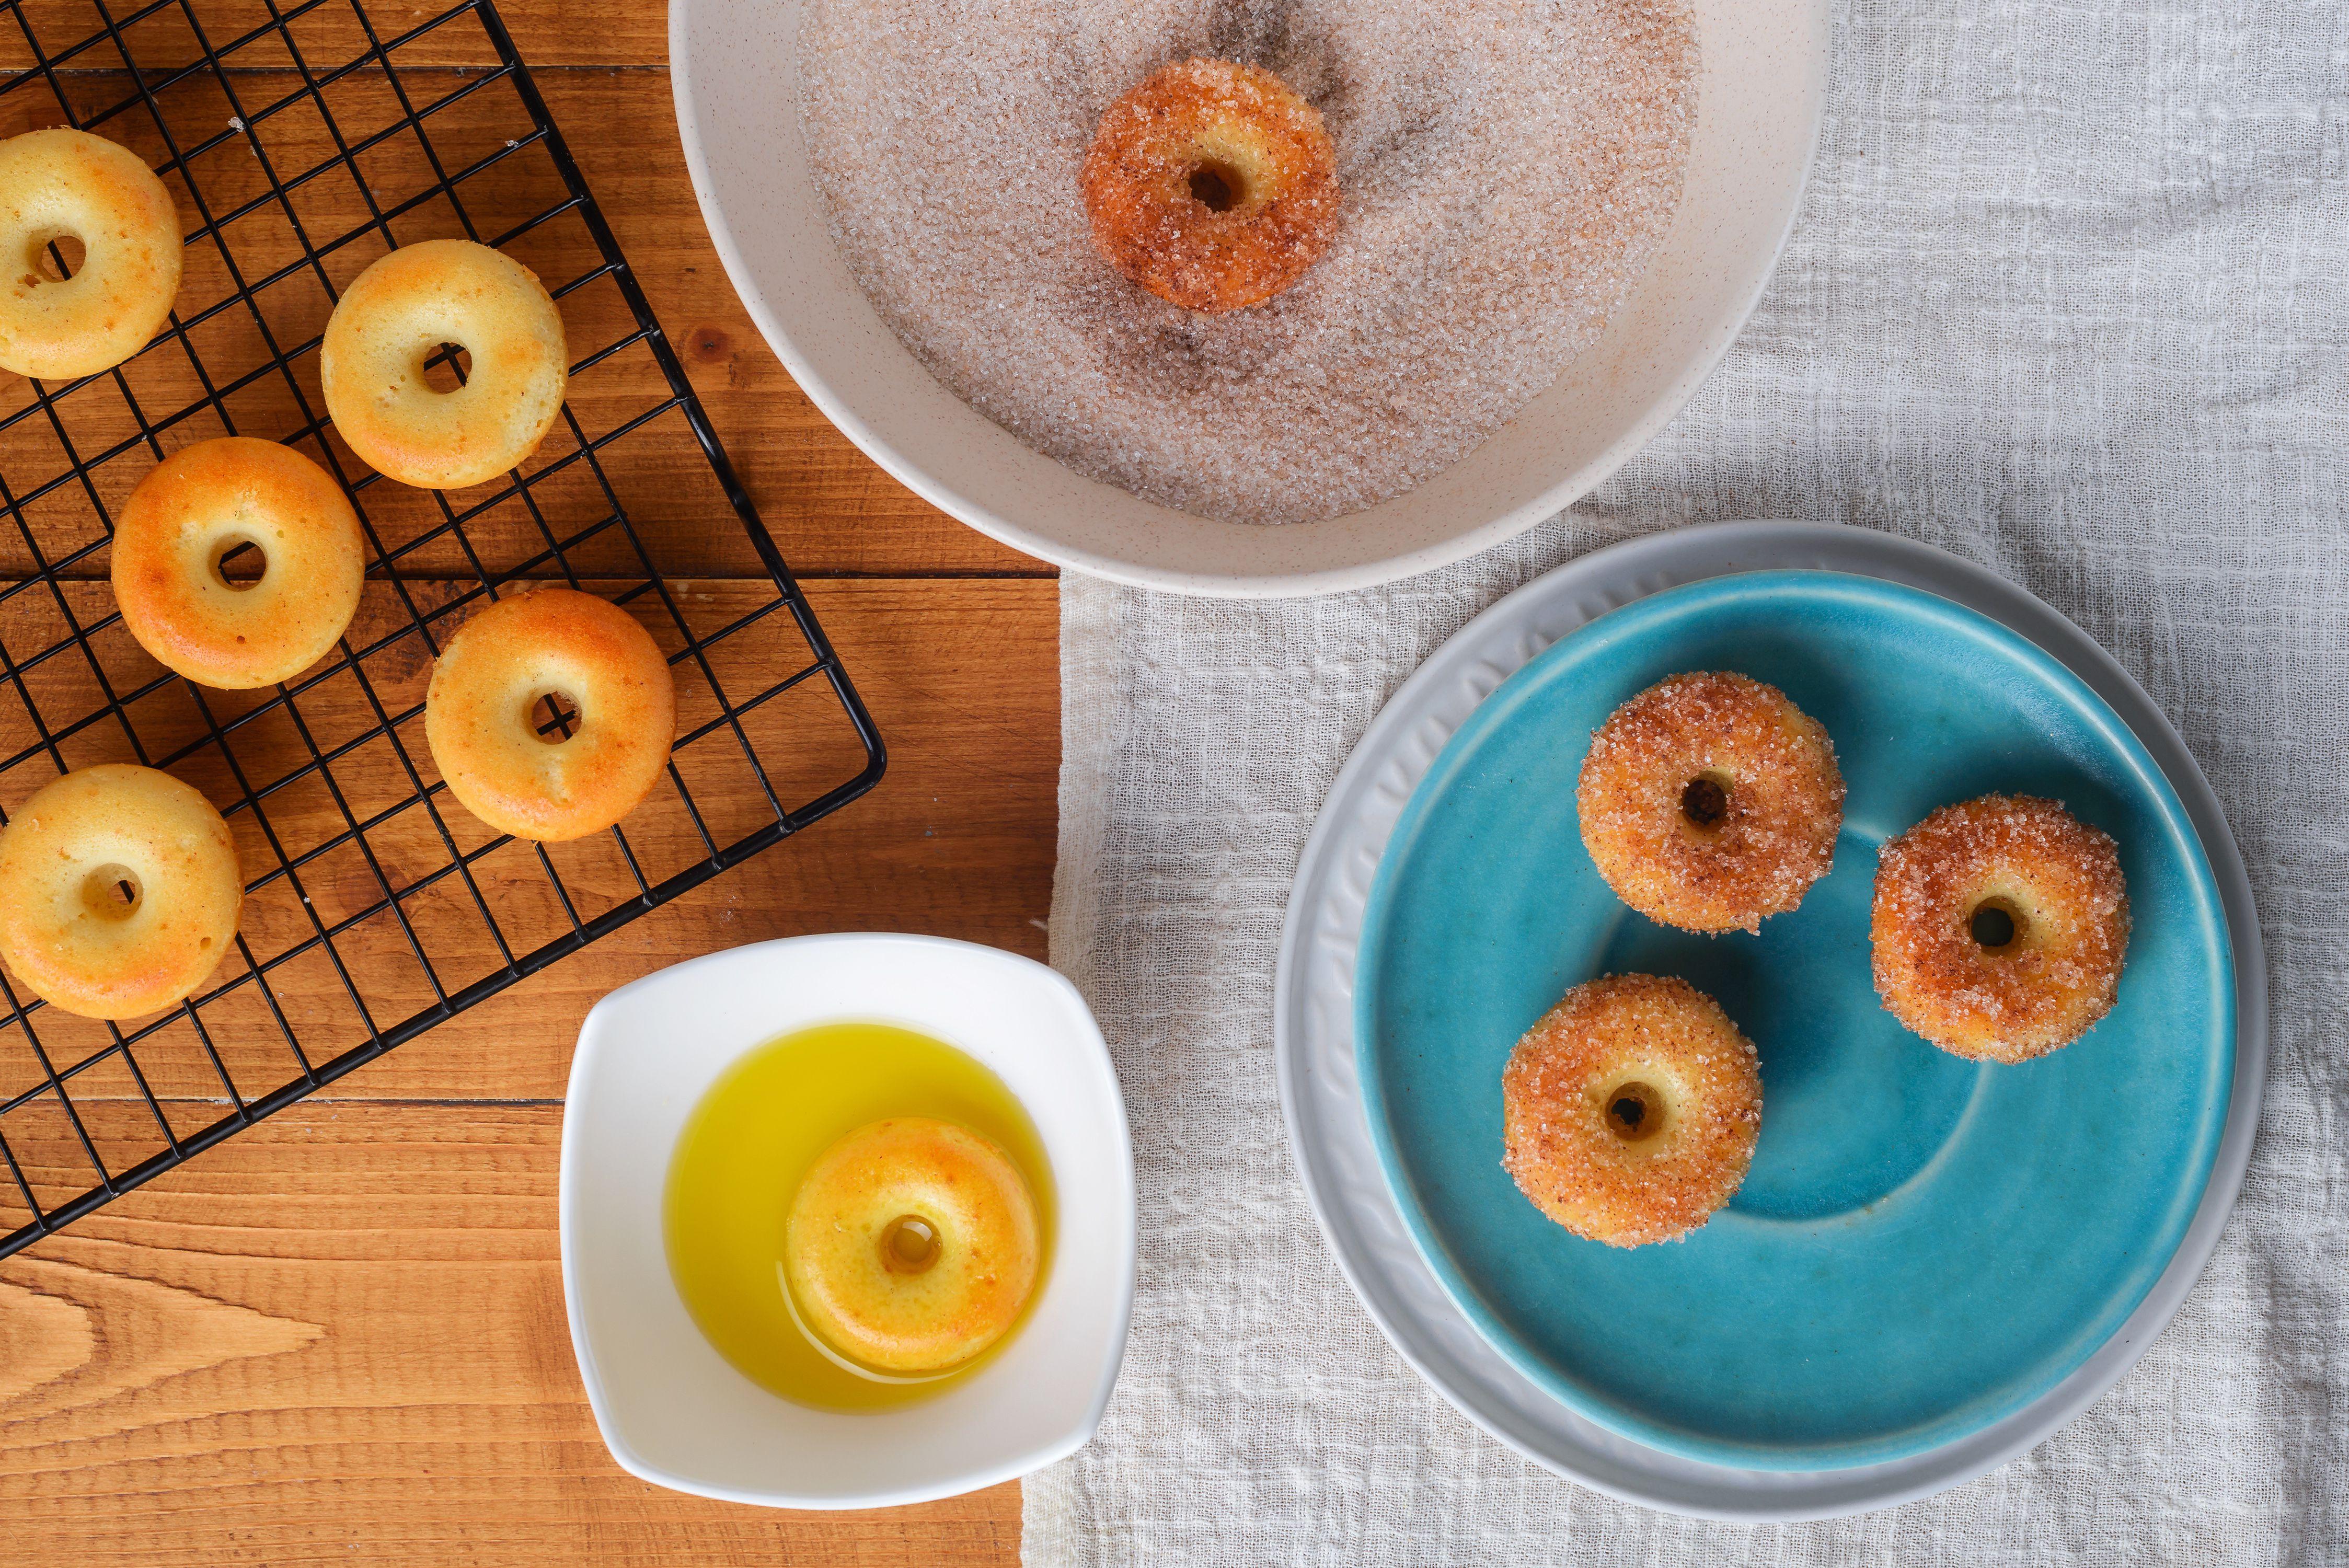 Fried doughnut